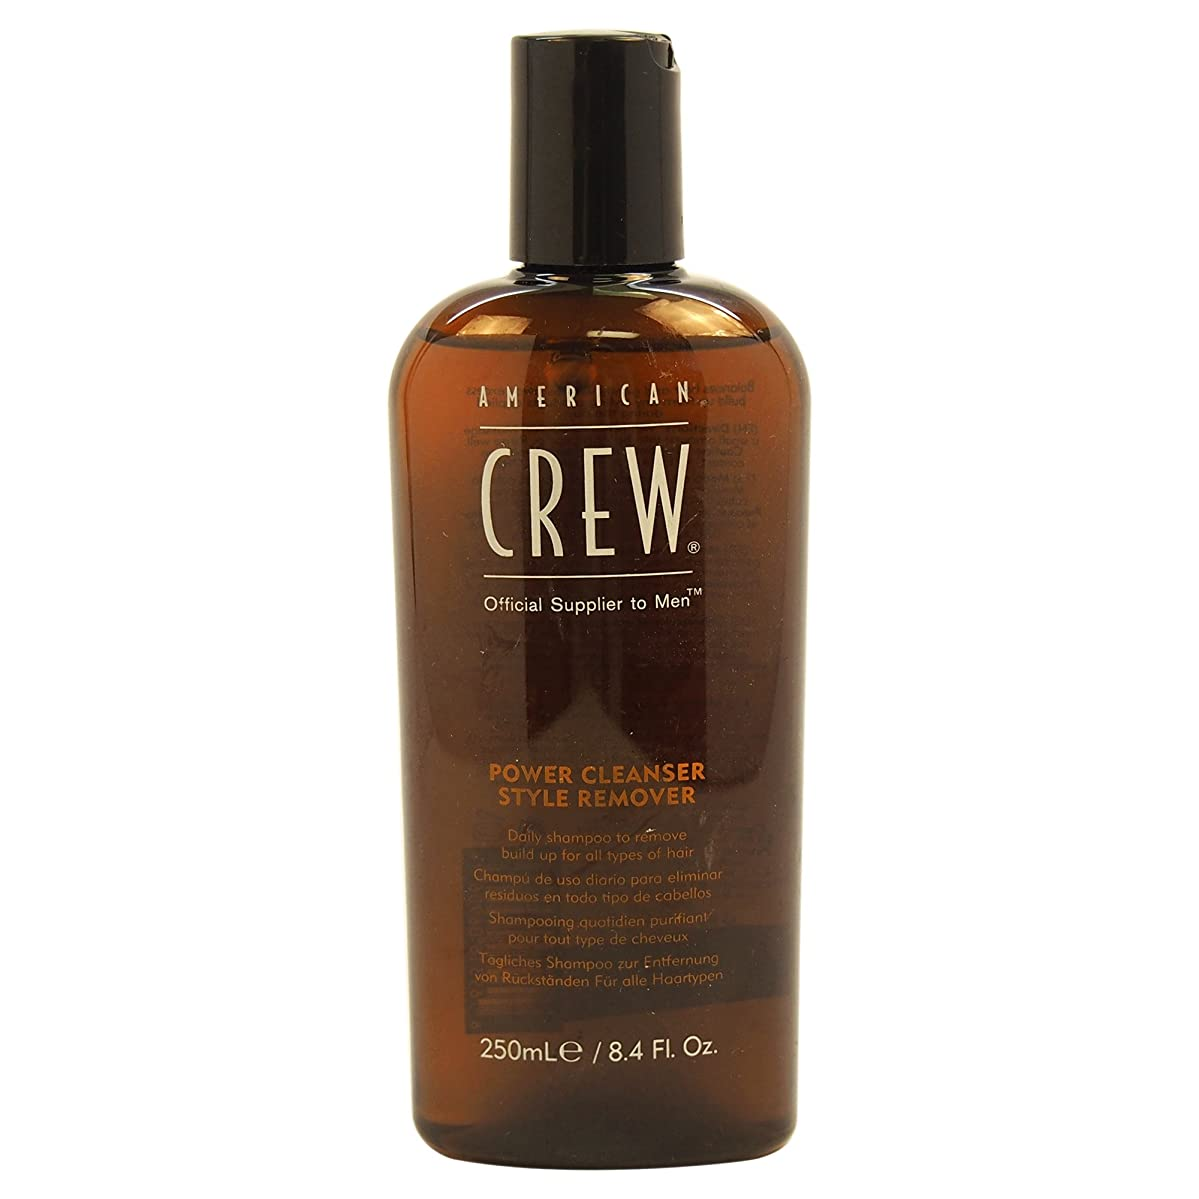 毎月独裁者練習American Crew Power Cleanser Style Remover Shampoo 250ml [並行輸入品]